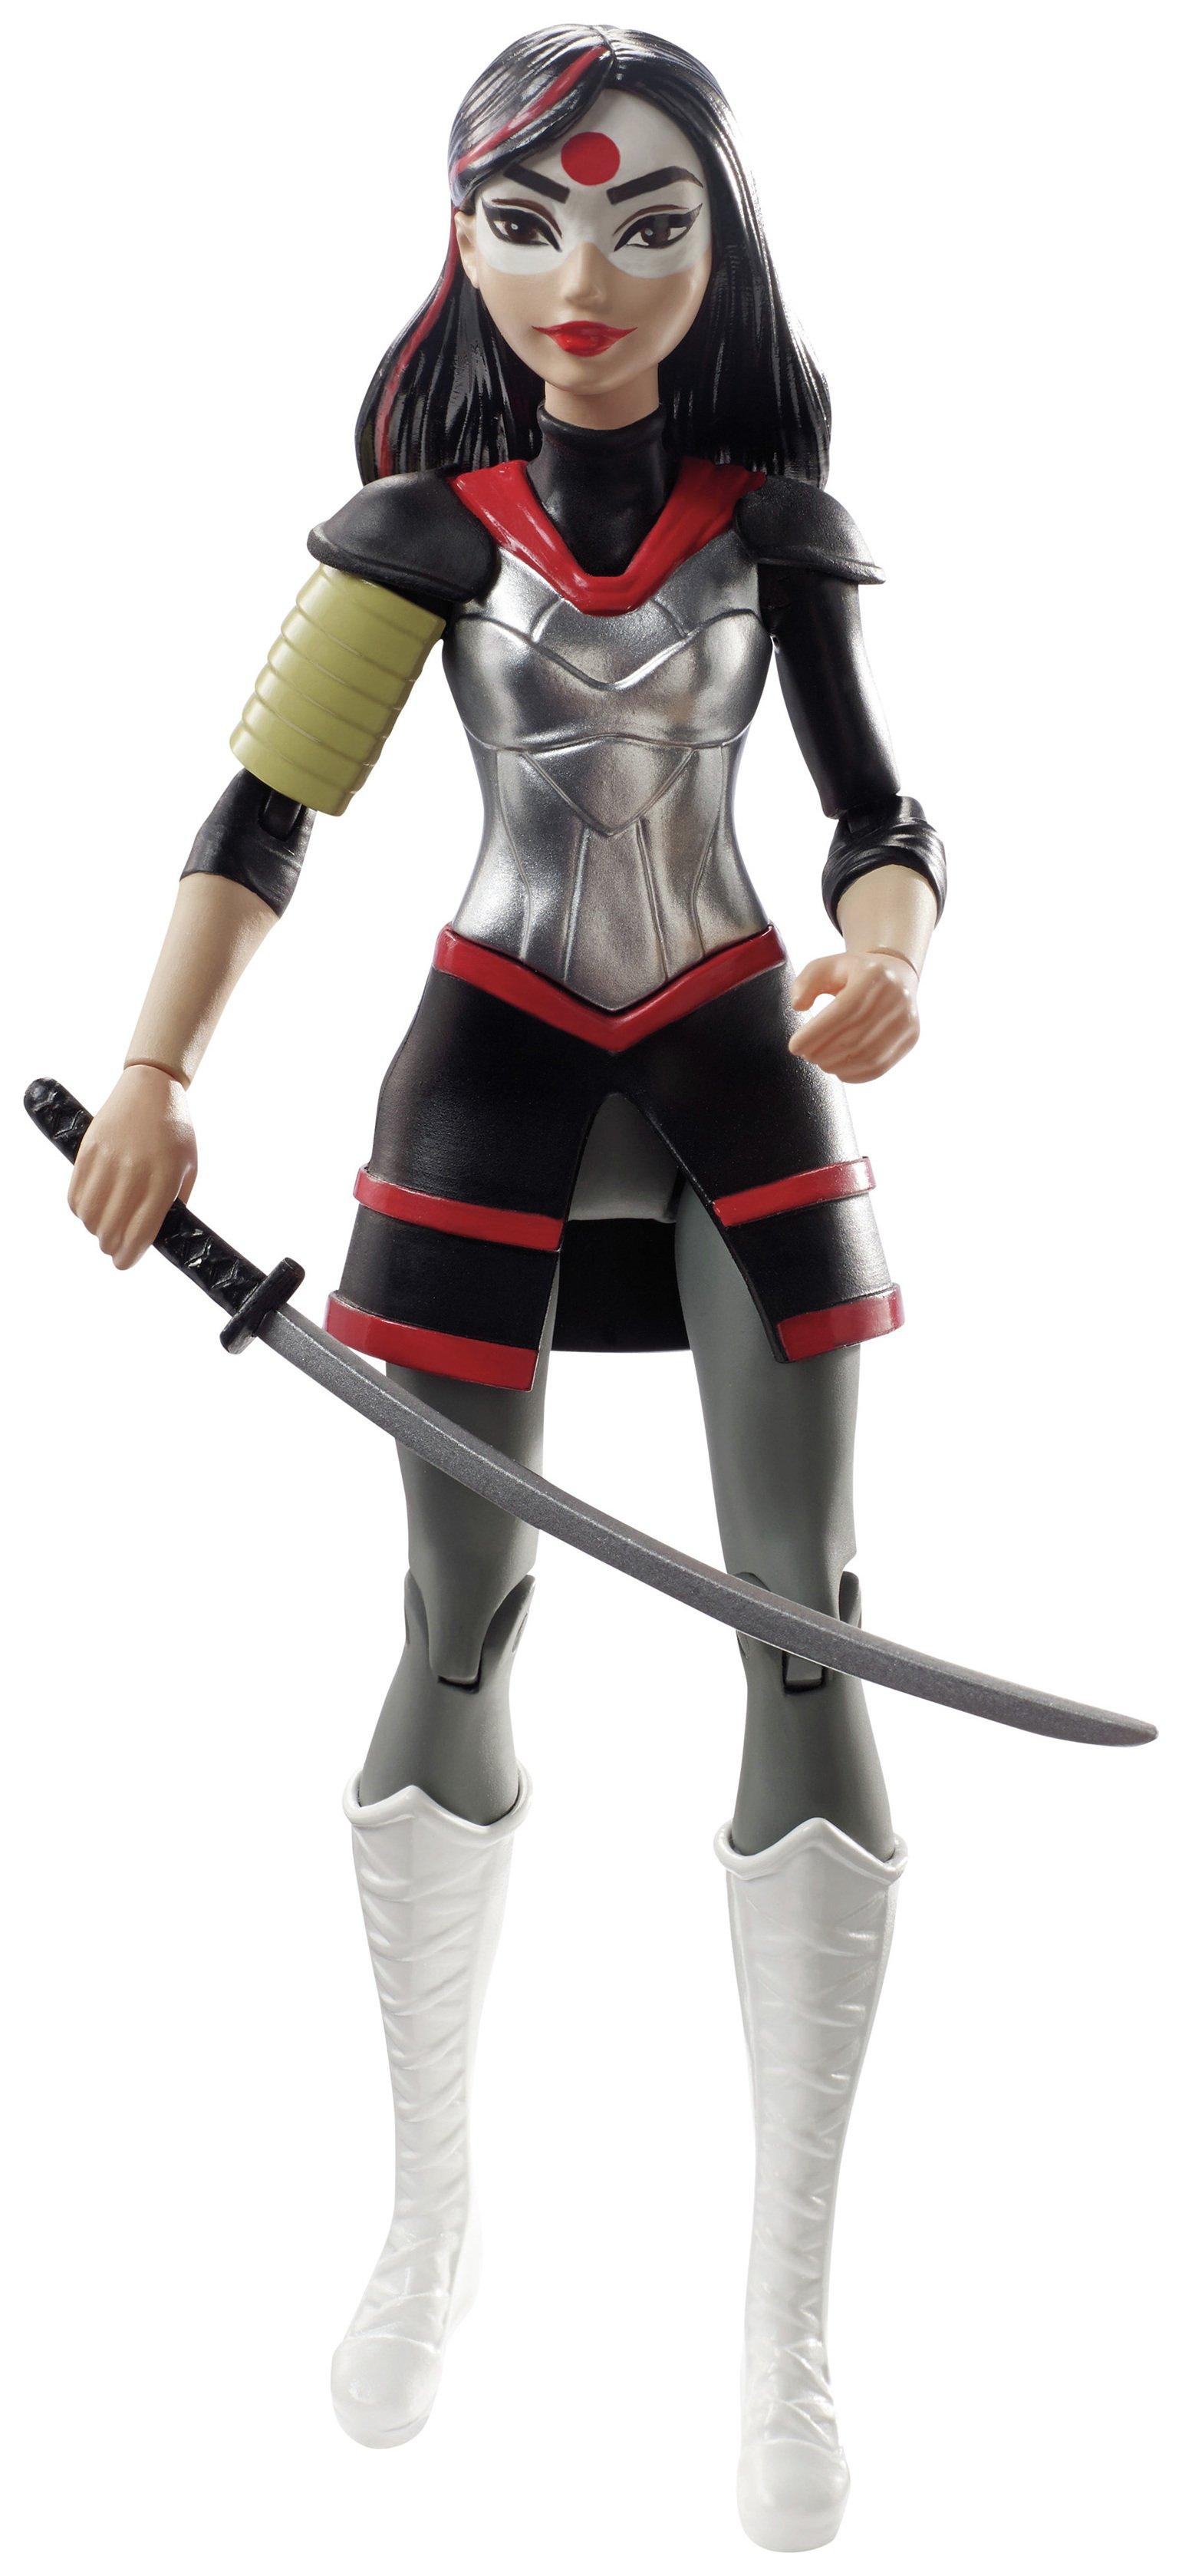 Image of DC Super Hero Girls Katana Action Figure Doll